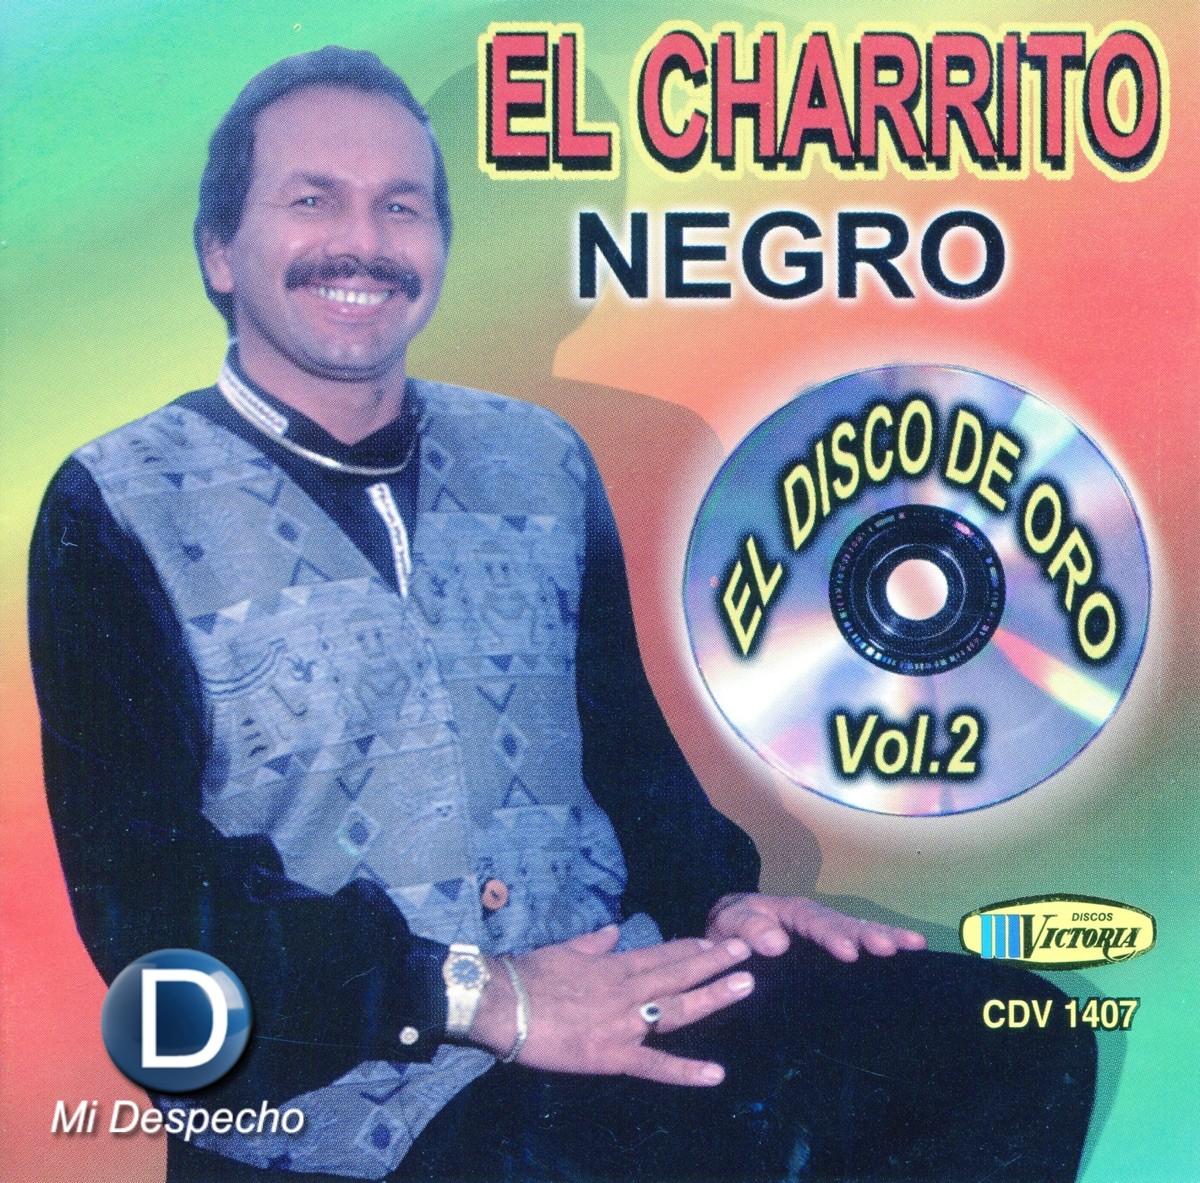 Charrito Negro El Disco De Oro Vol. 2 Frontal